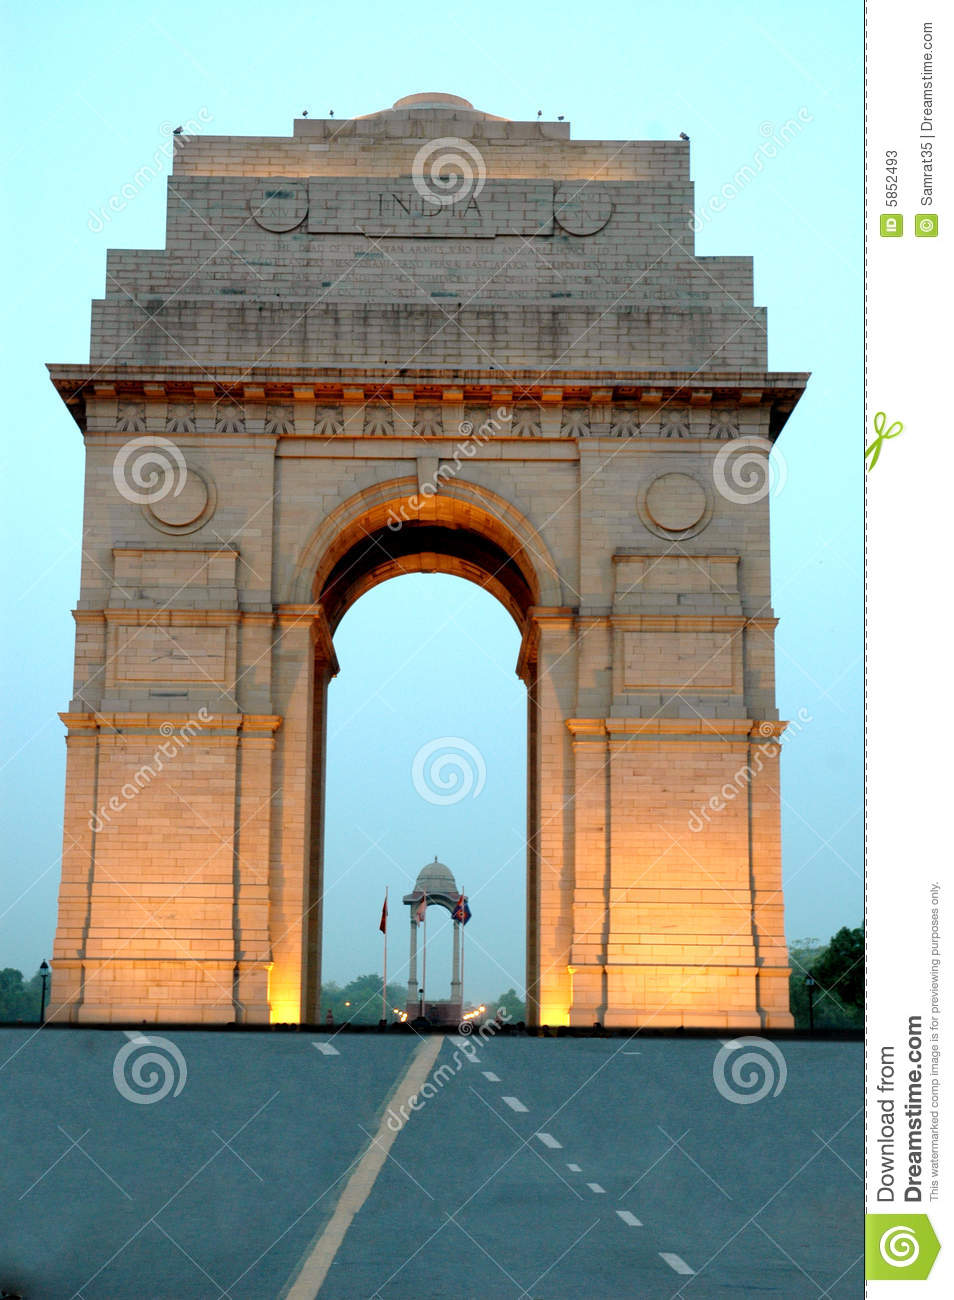 India Gate. Stock Photos.